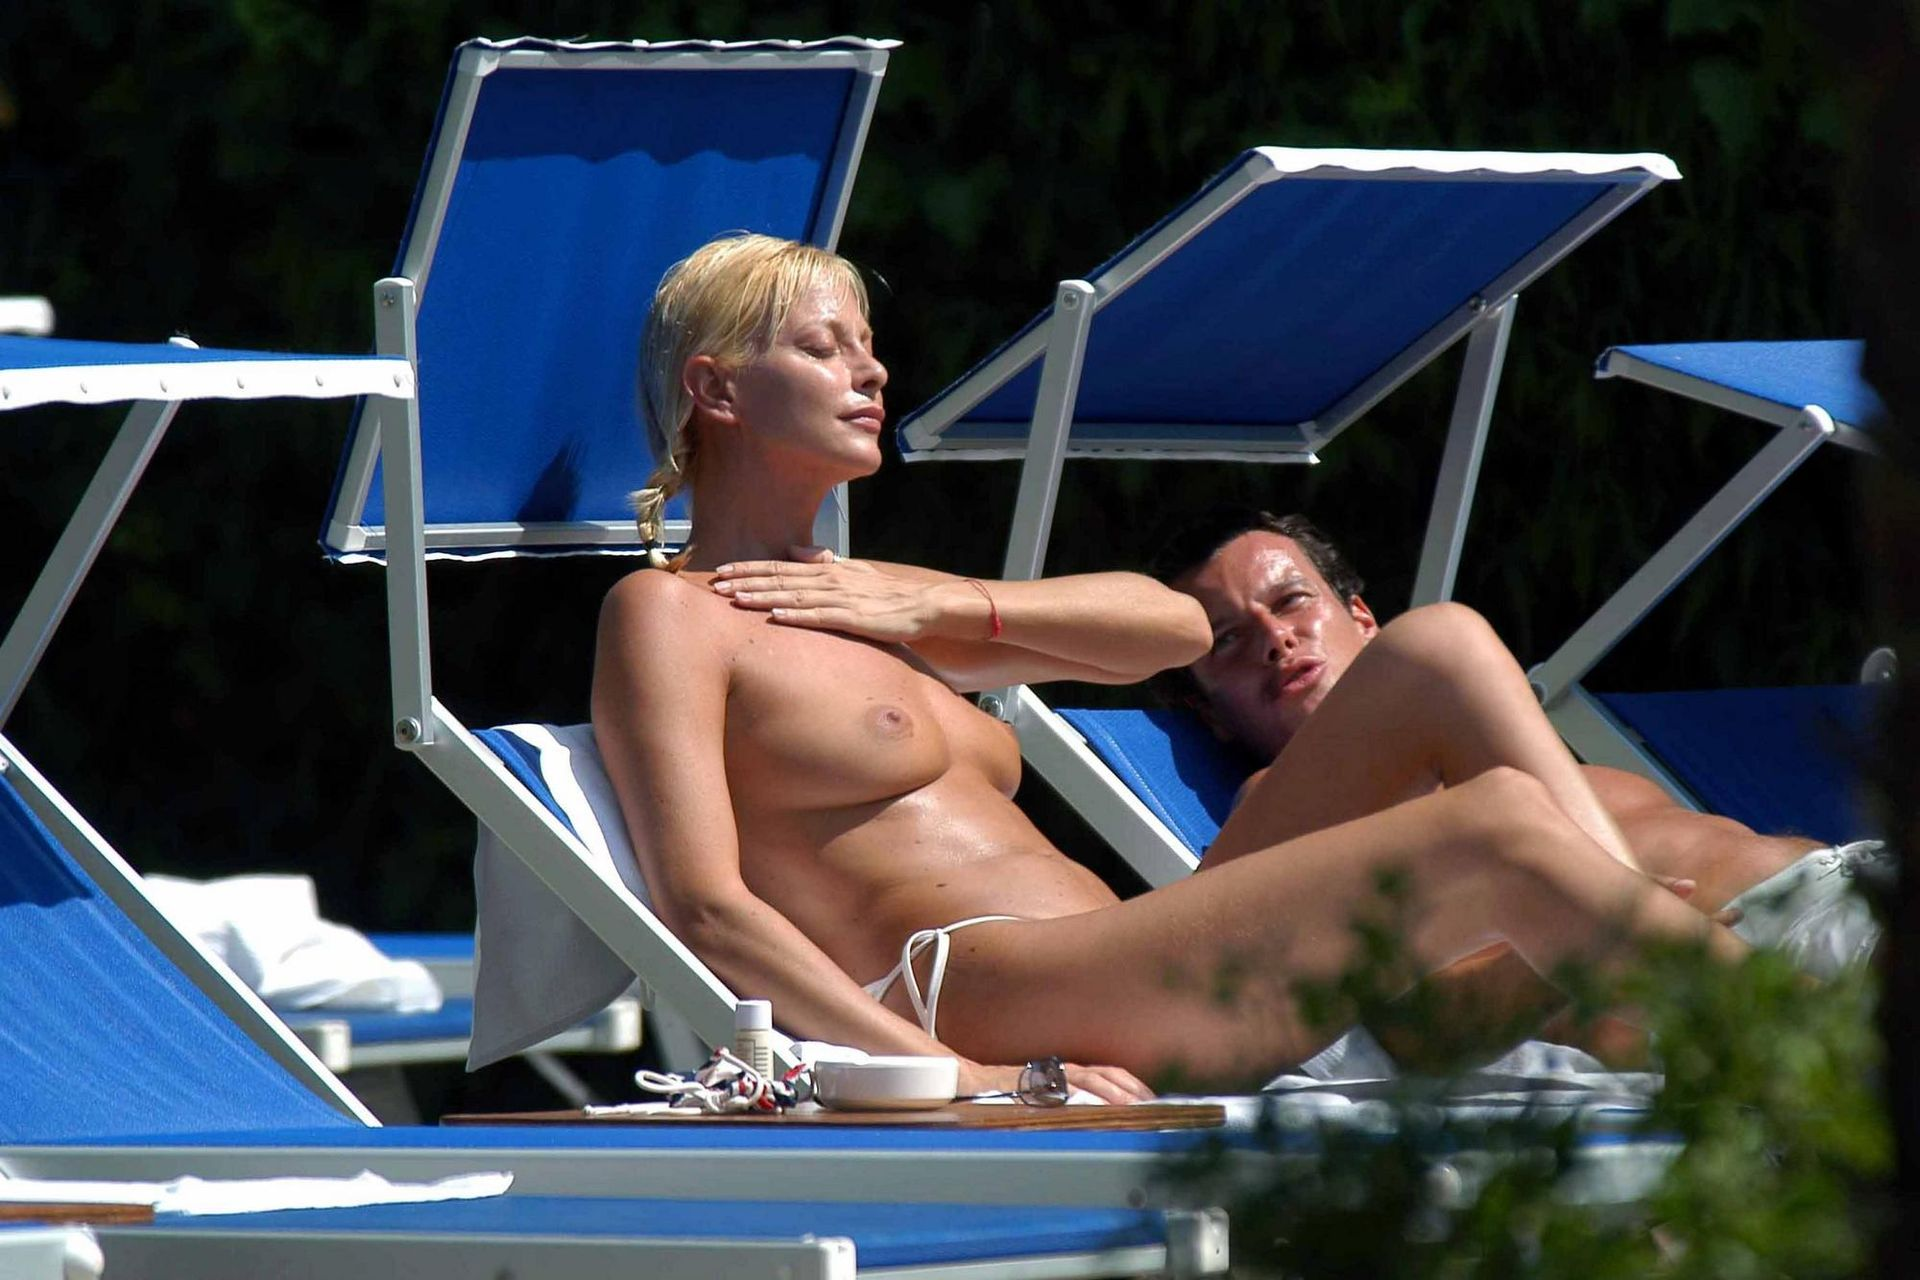 Celebs On The Beach In Bikinis